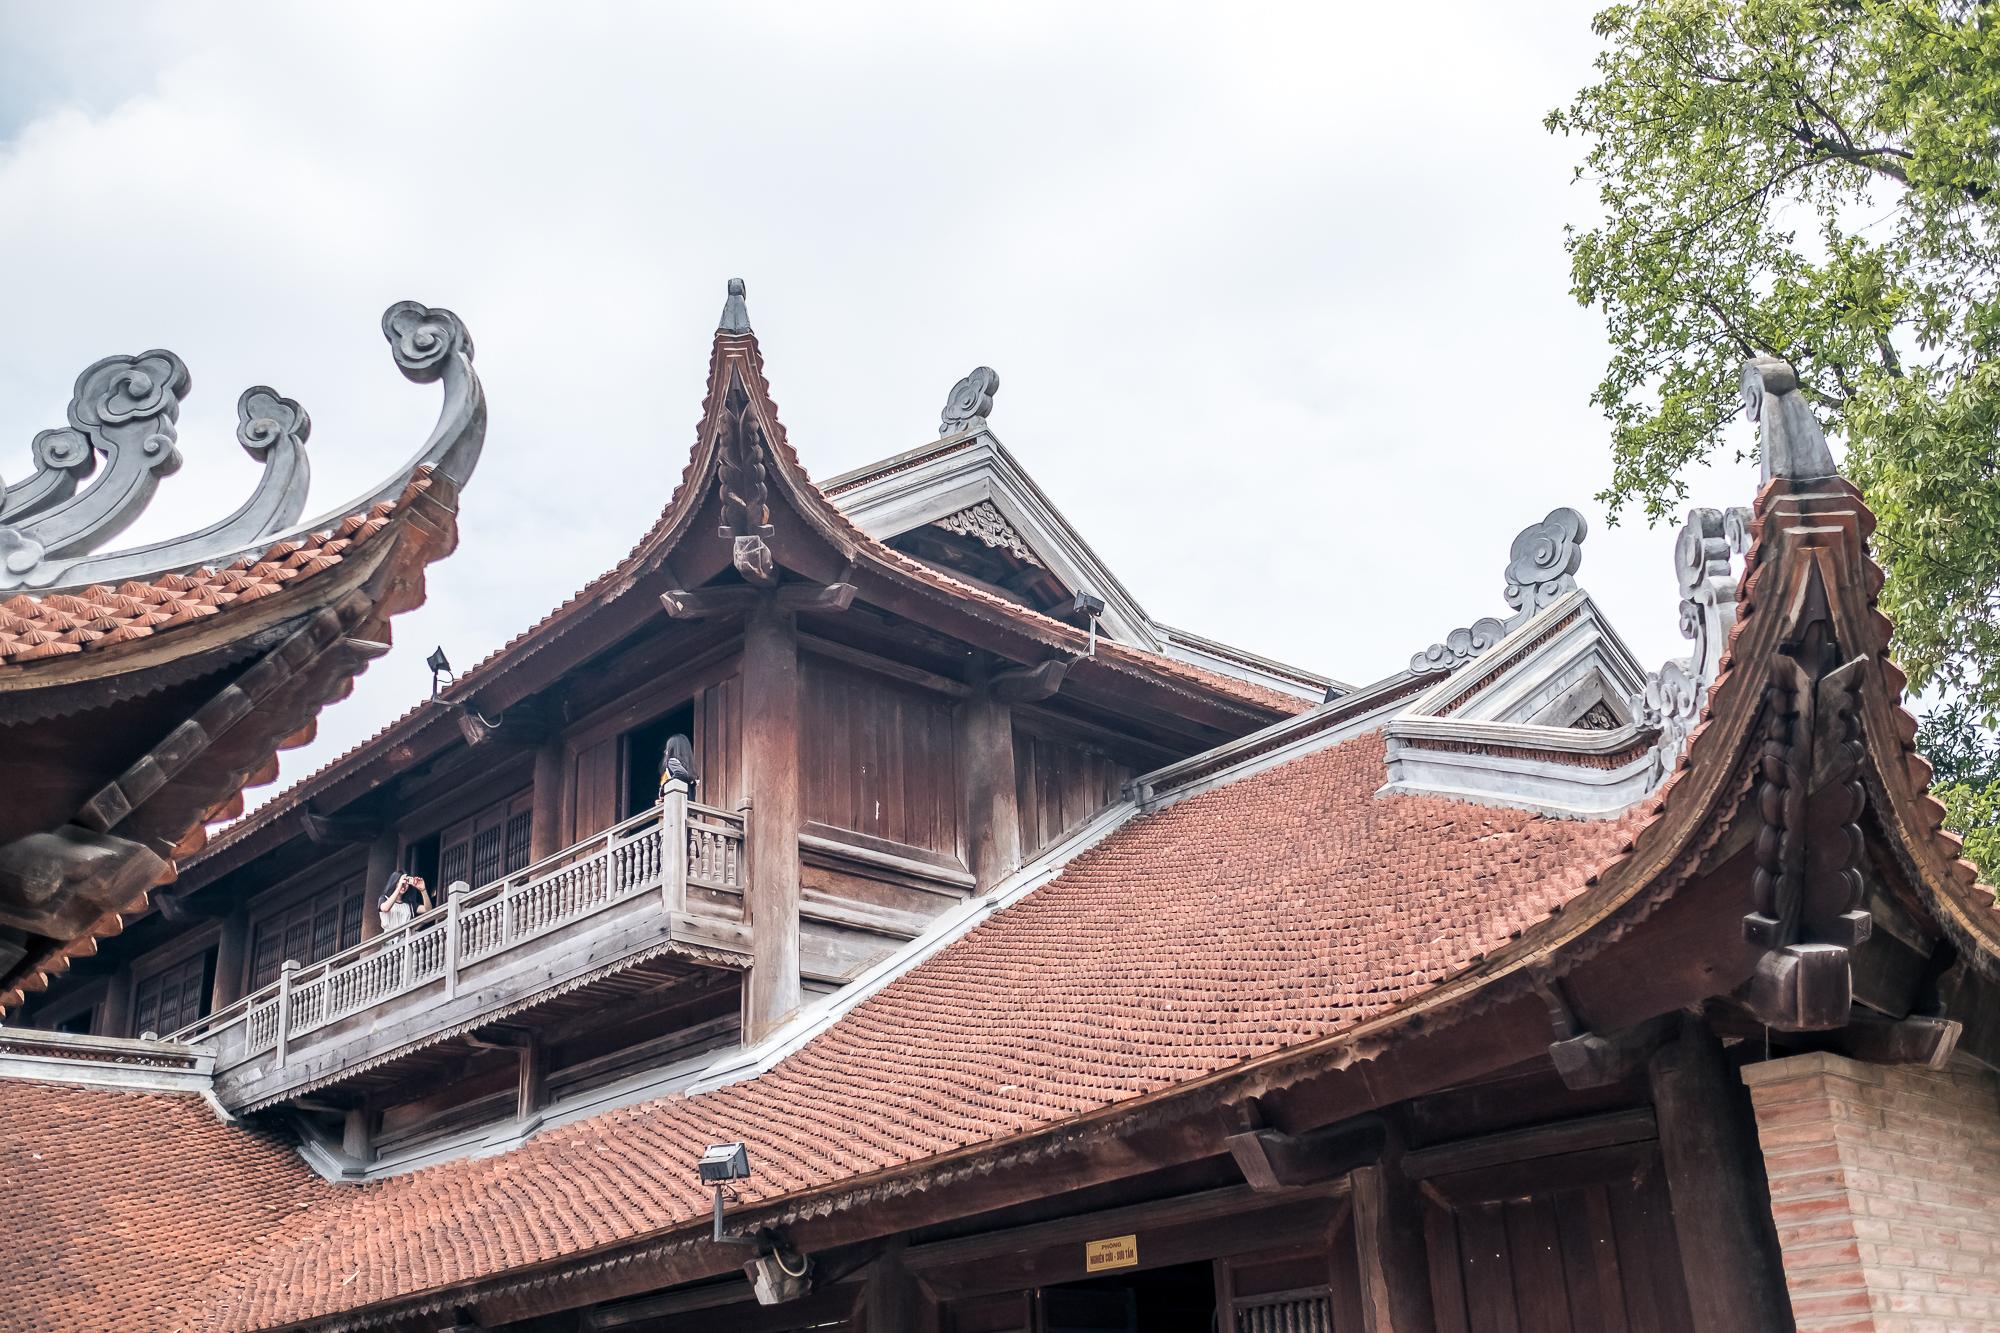 Vietnam_Honeymoon_TheOutsiderBlog_DSCF8017.JPG